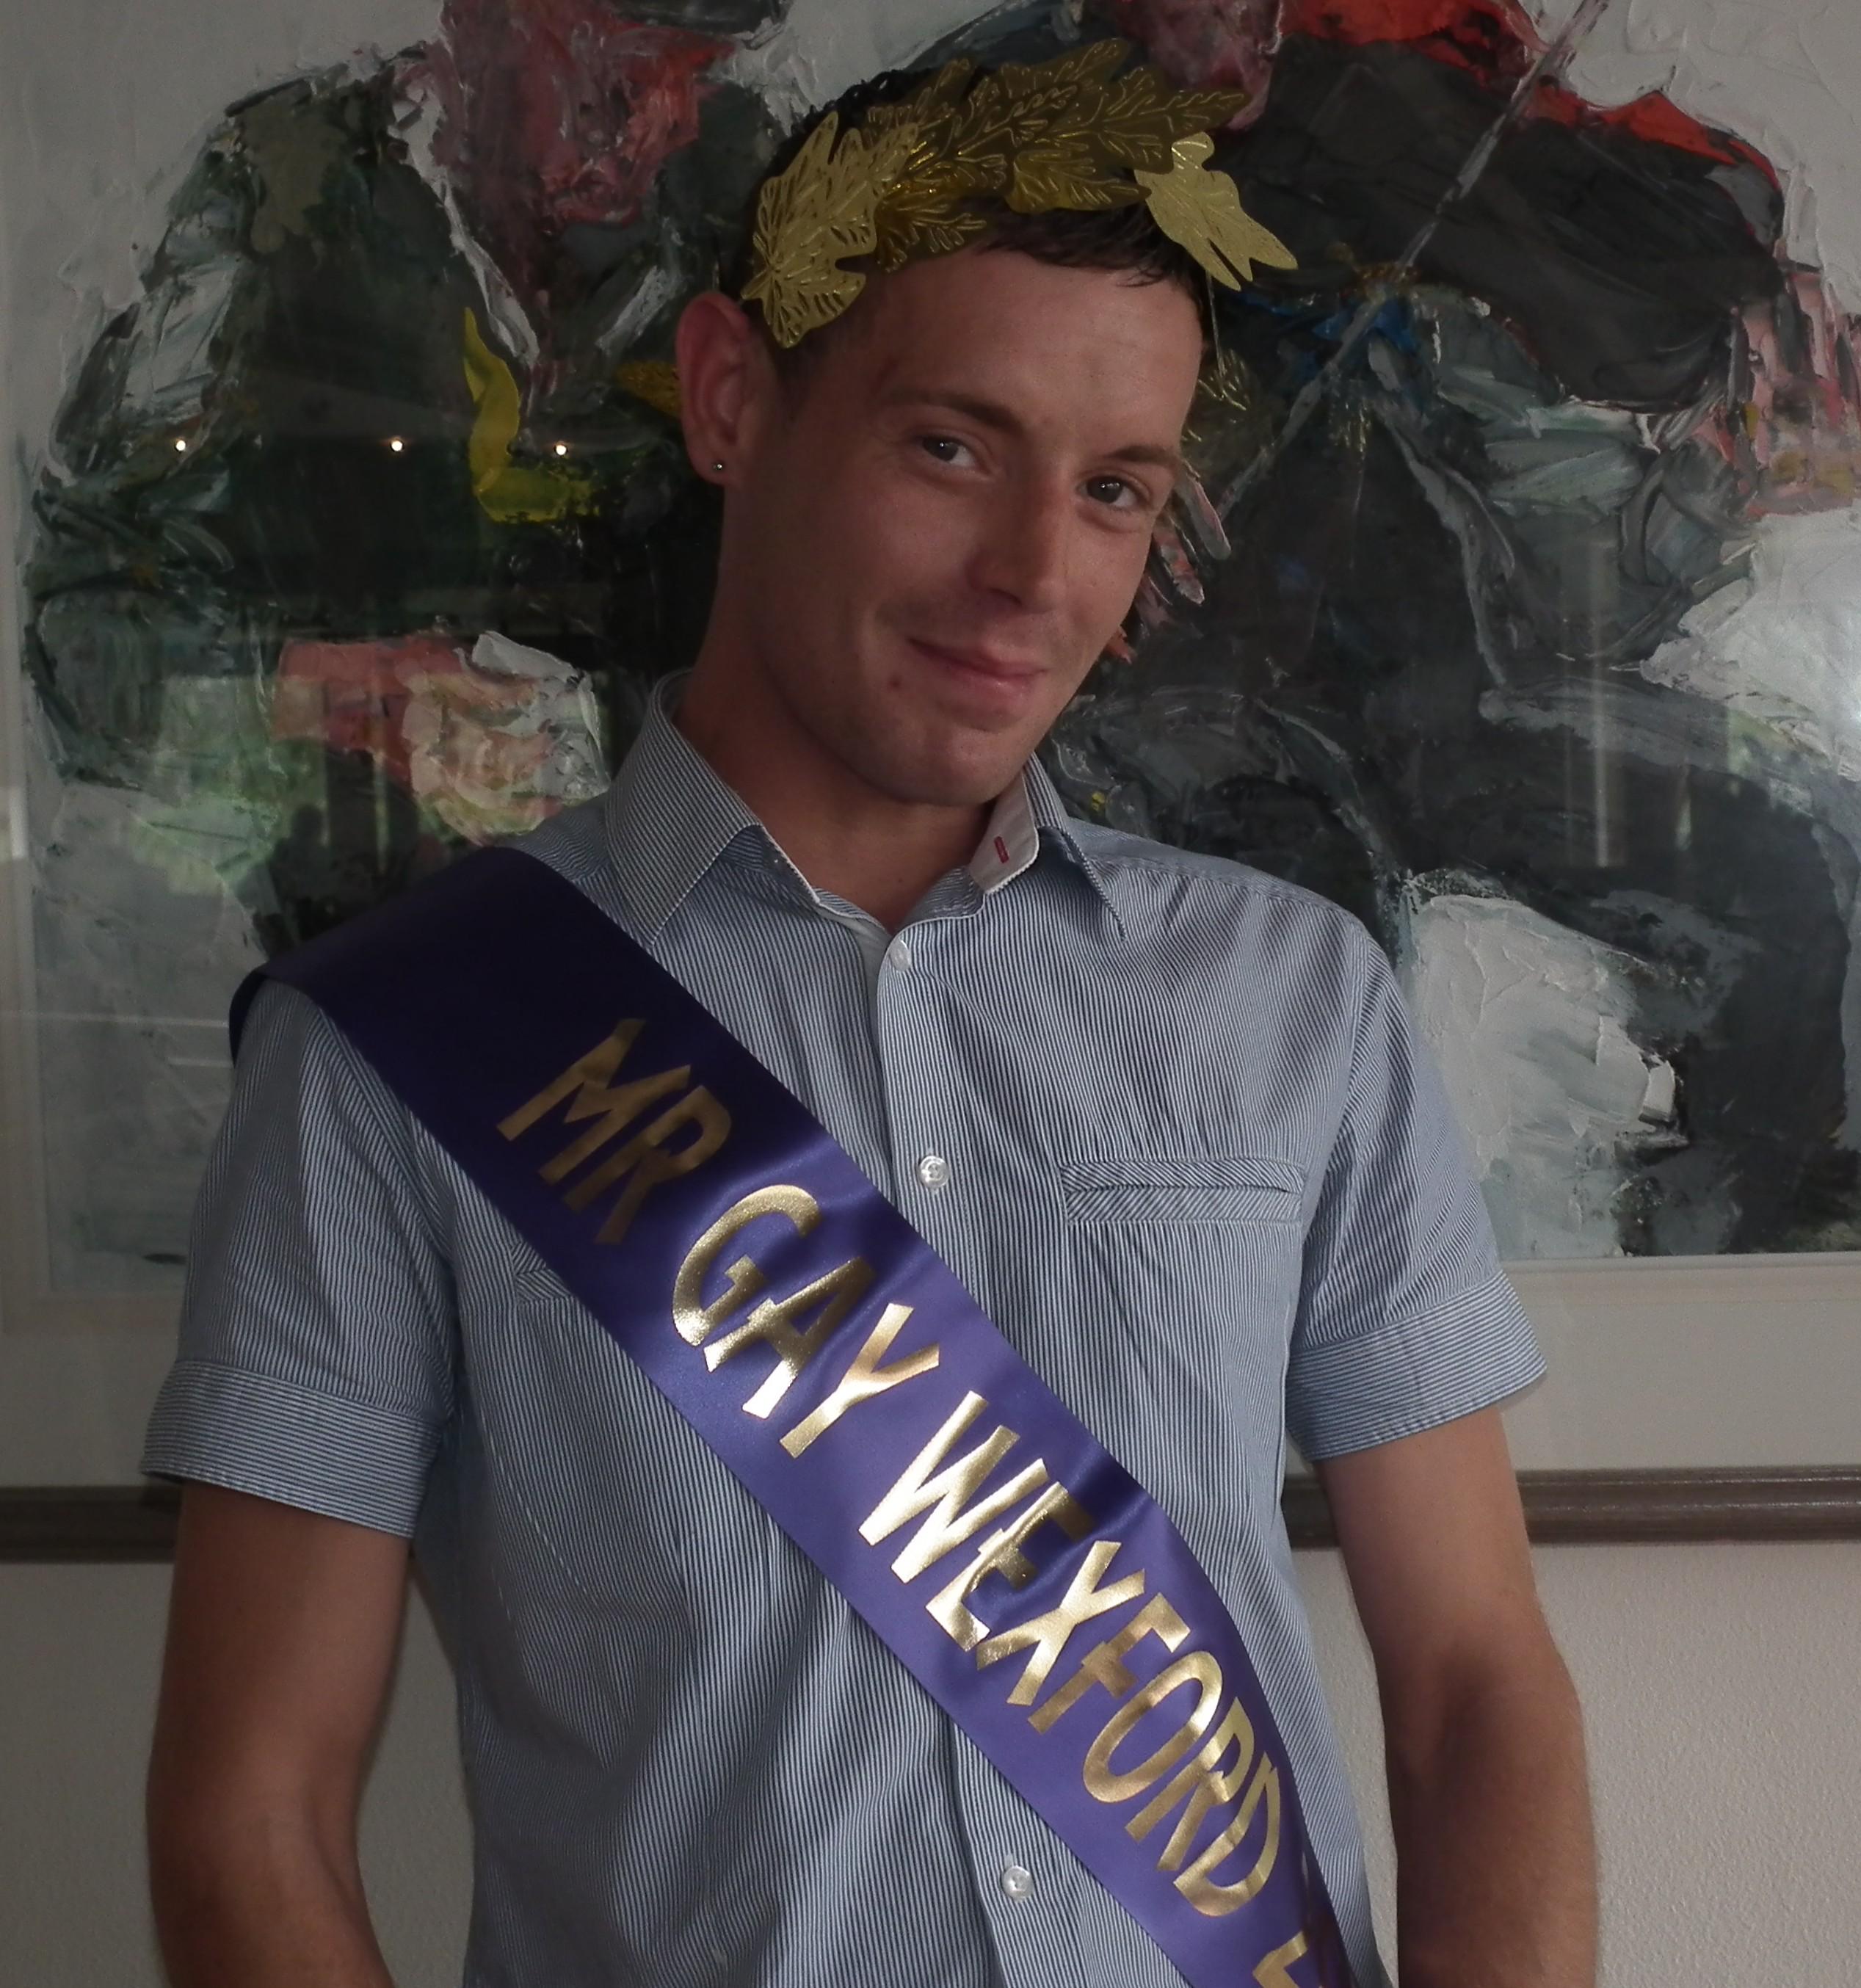 To date Mr Gay Ireland has raised€